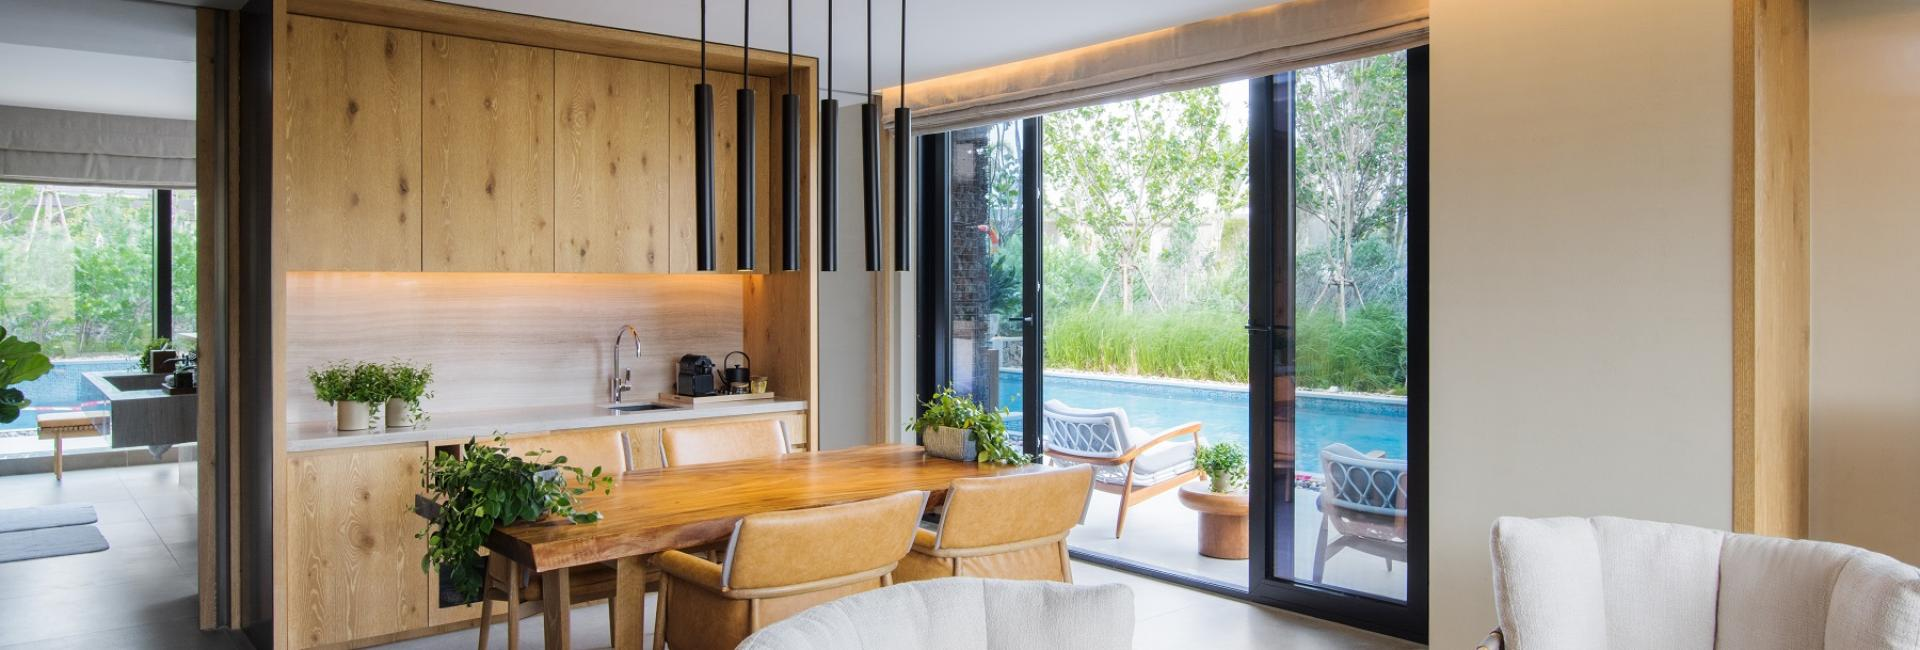 Lagoon Plunge Pool Suite-Living Room 精选池畔套房-客厅